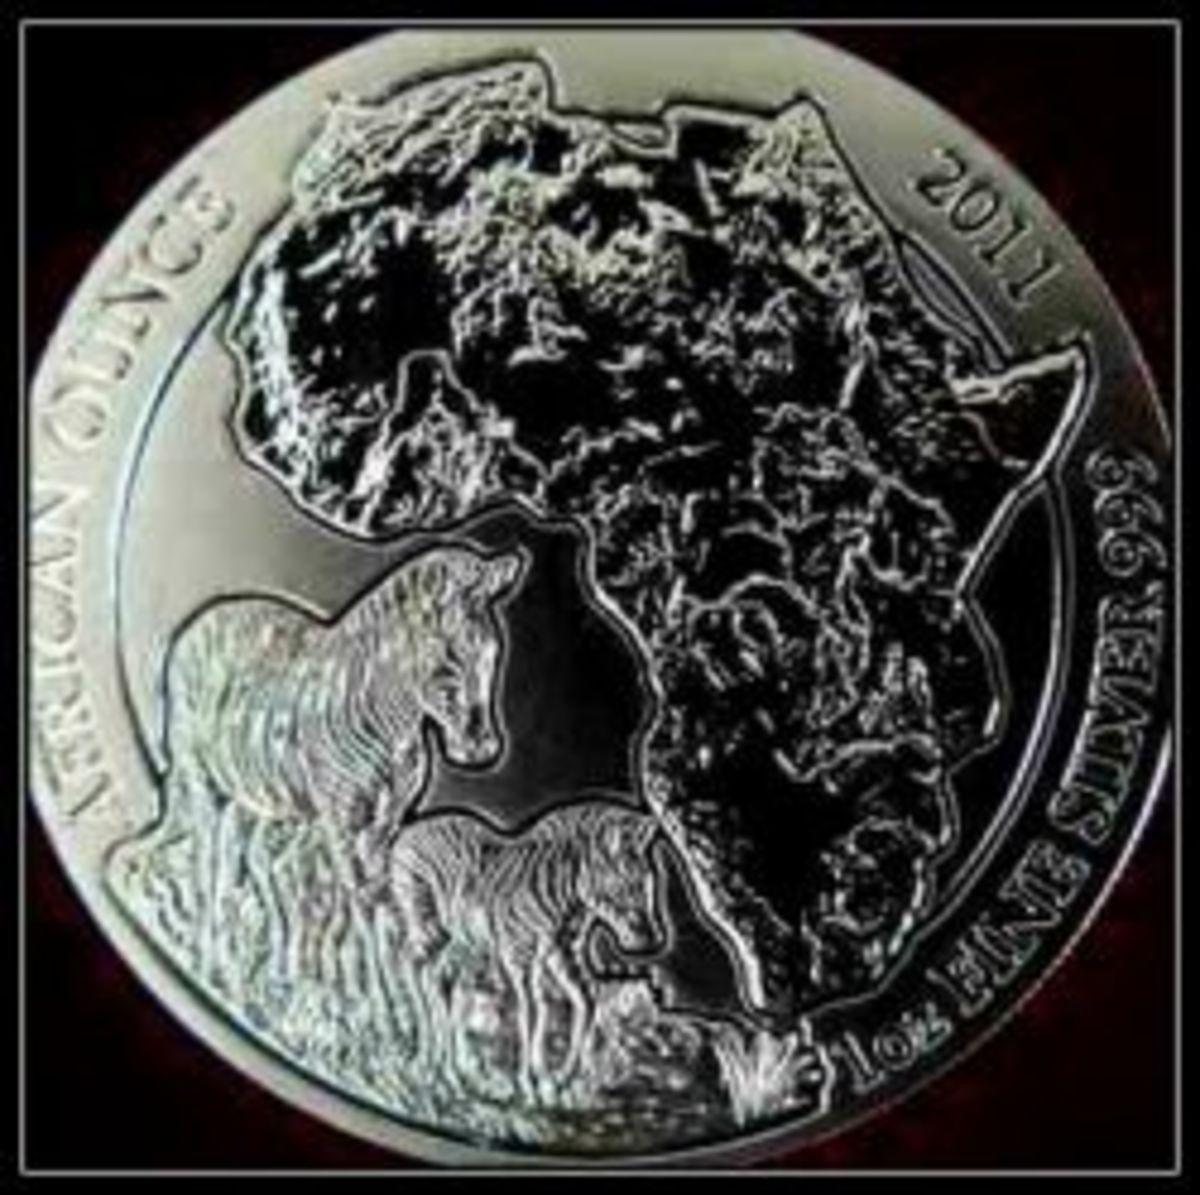 2011 Rwanda Zebra Silver Coin